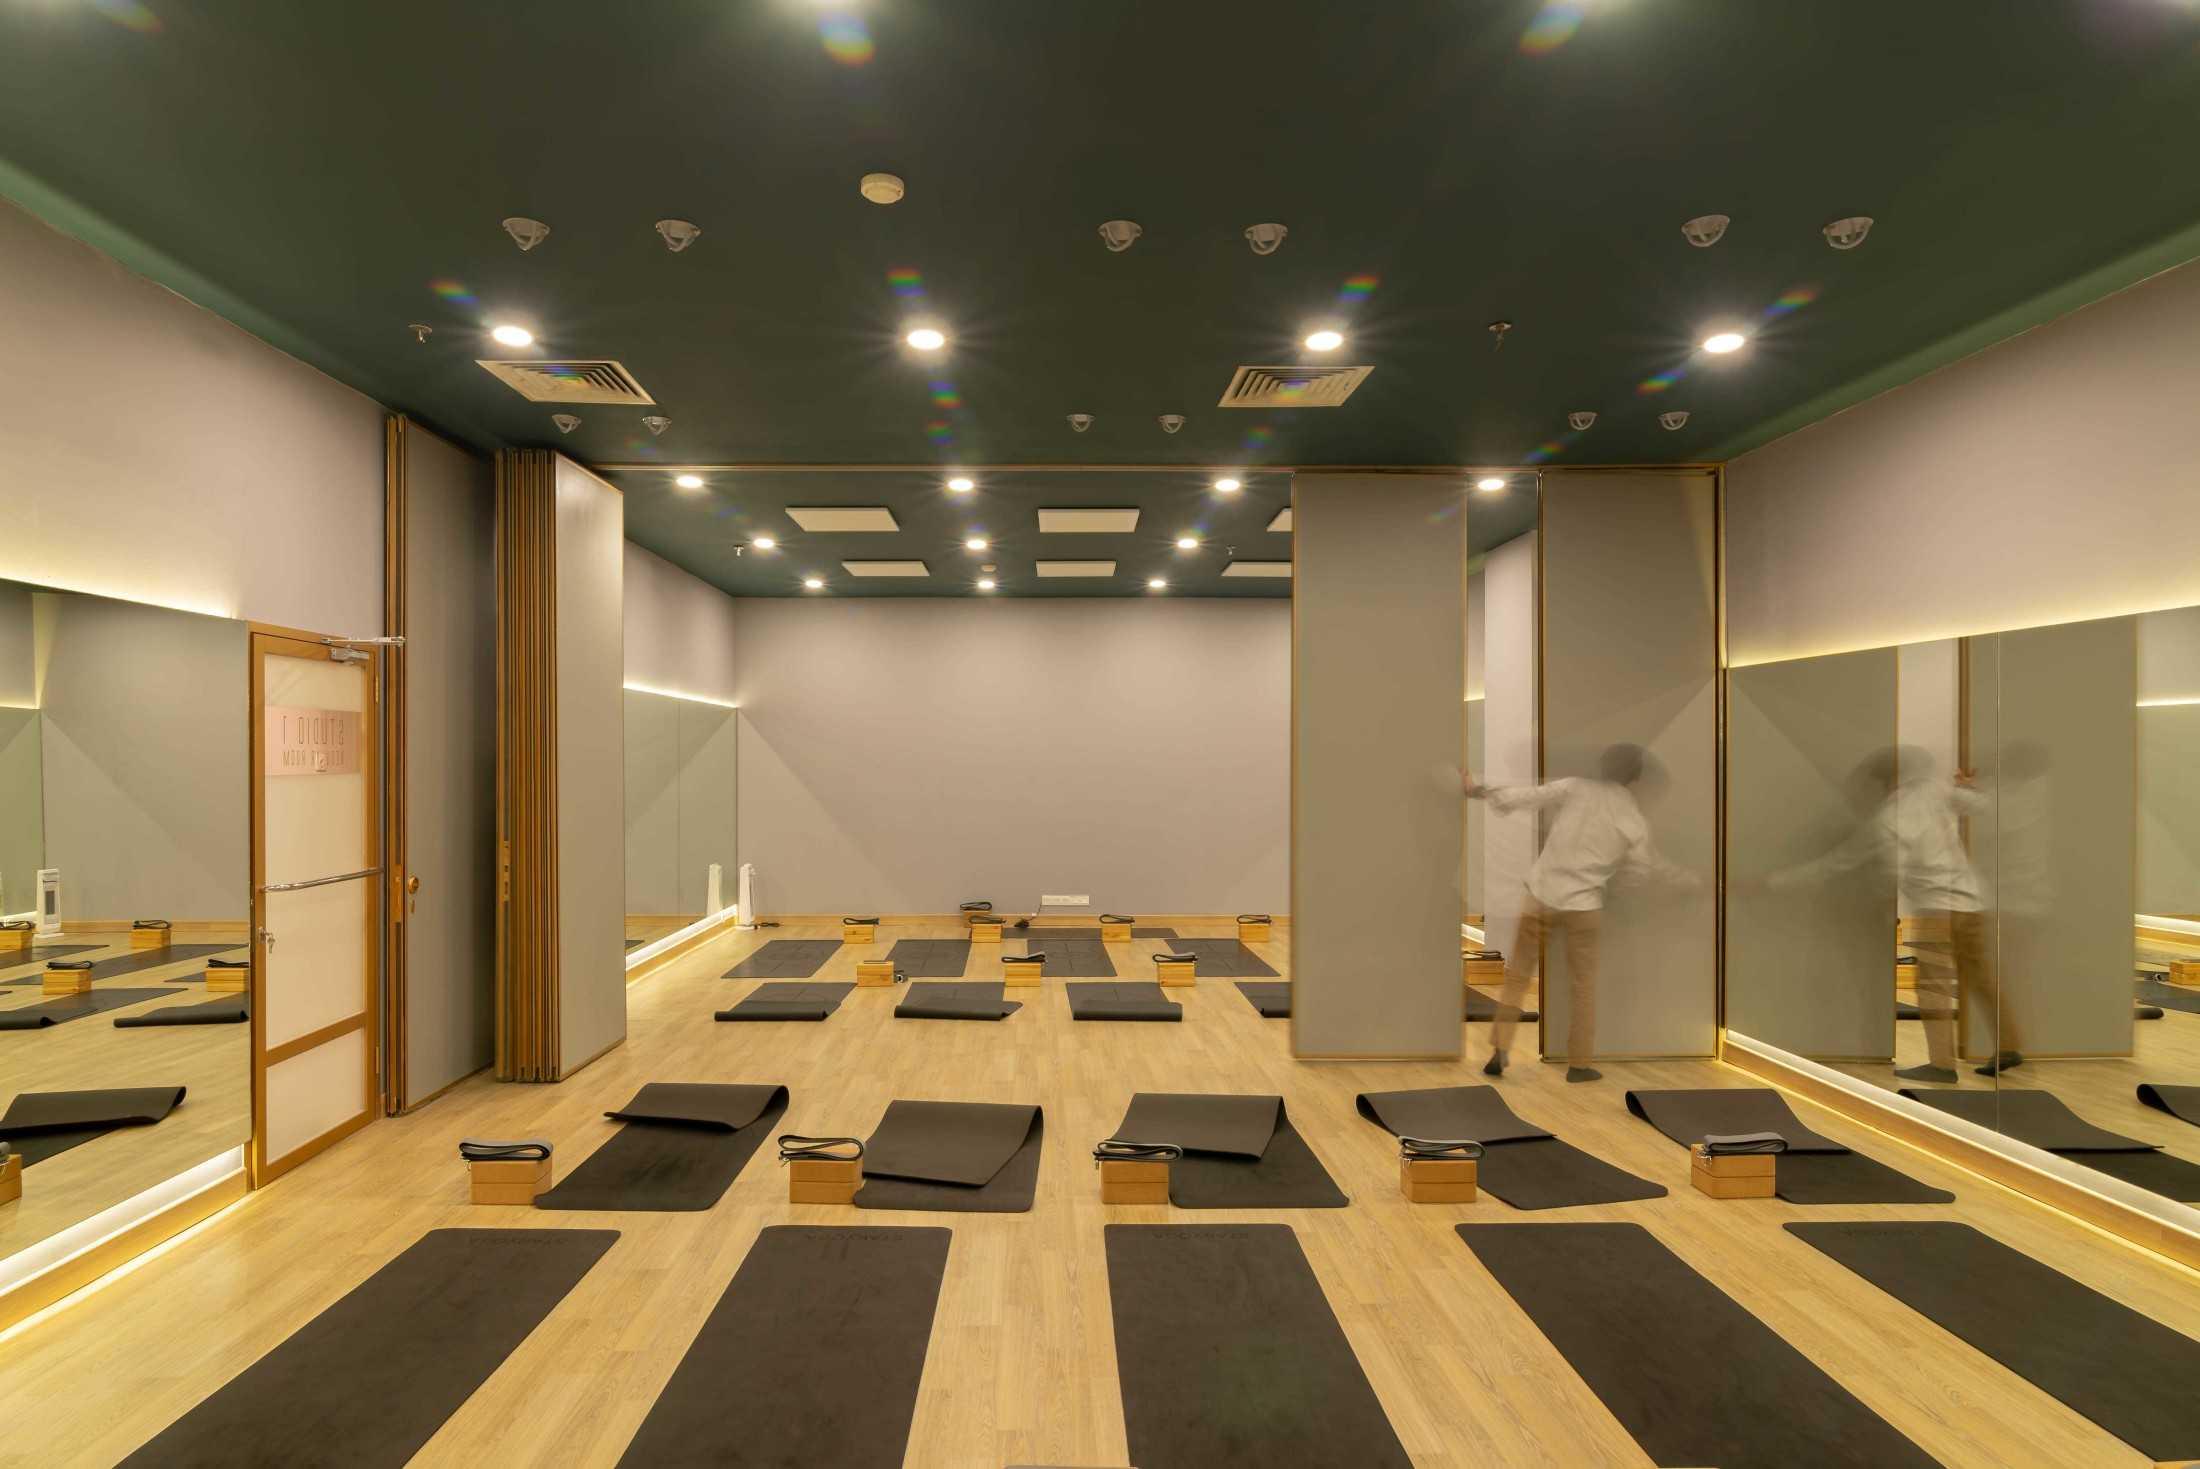 Archid Design&build Star Yoga Kec. Klp. Gading, Kota Jkt Utara, Daerah Khusus Ibukota Jakarta, Indonesia Kec. Klp. Gading, Kota Jkt Utara, Daerah Khusus Ibukota Jakarta, Indonesia Archid-Design-Build-Star-Yoga  88011